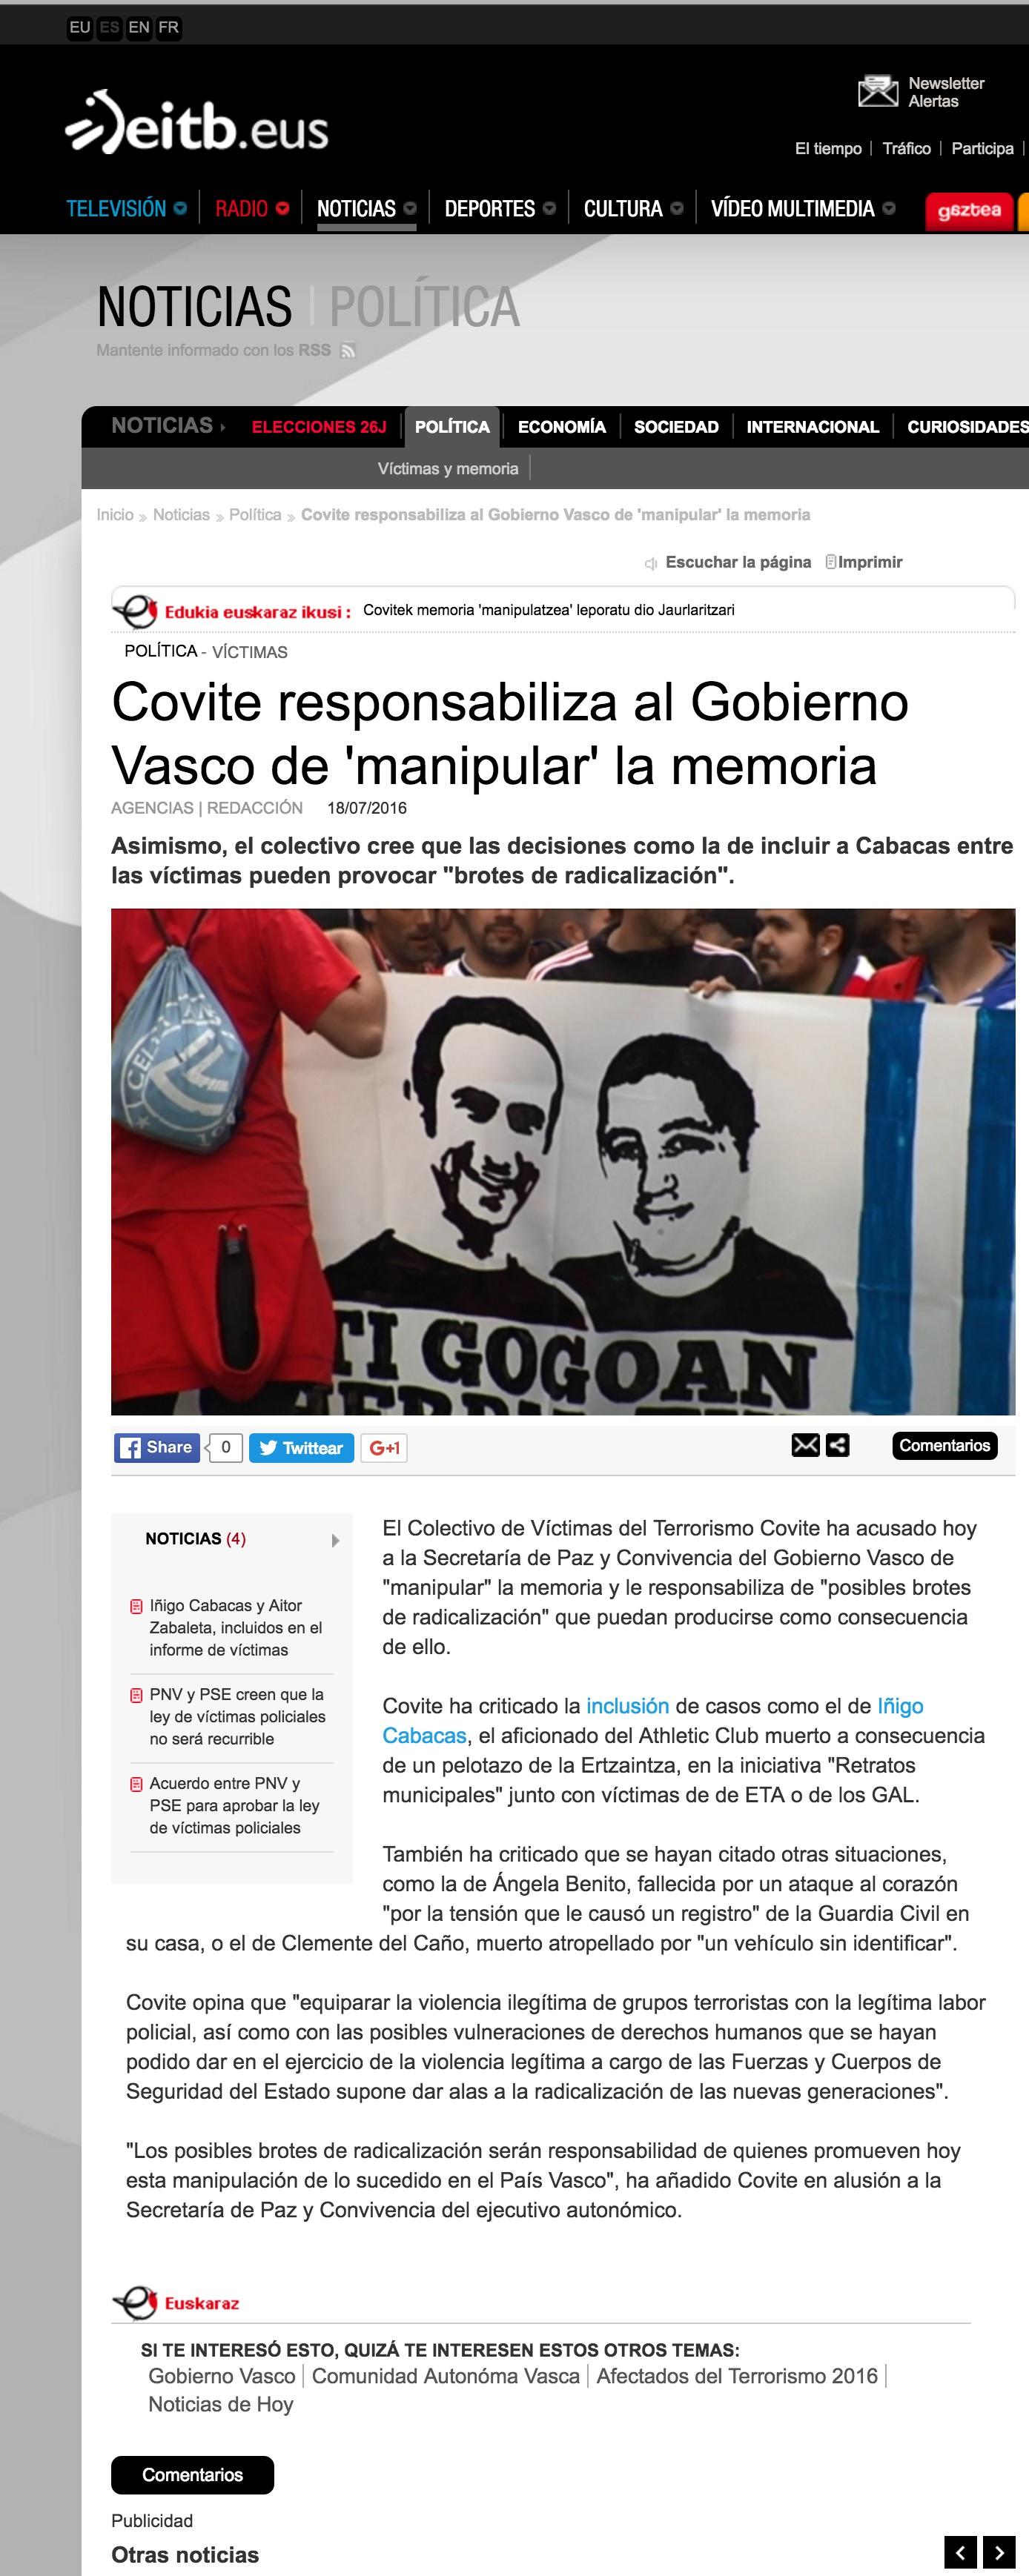 screencapture-www-eitb-eus-es-noticias-politica-detalle-4248074-covite-responsabiliza-al-gobierno-vasco-manipular-memoria-1468917956931